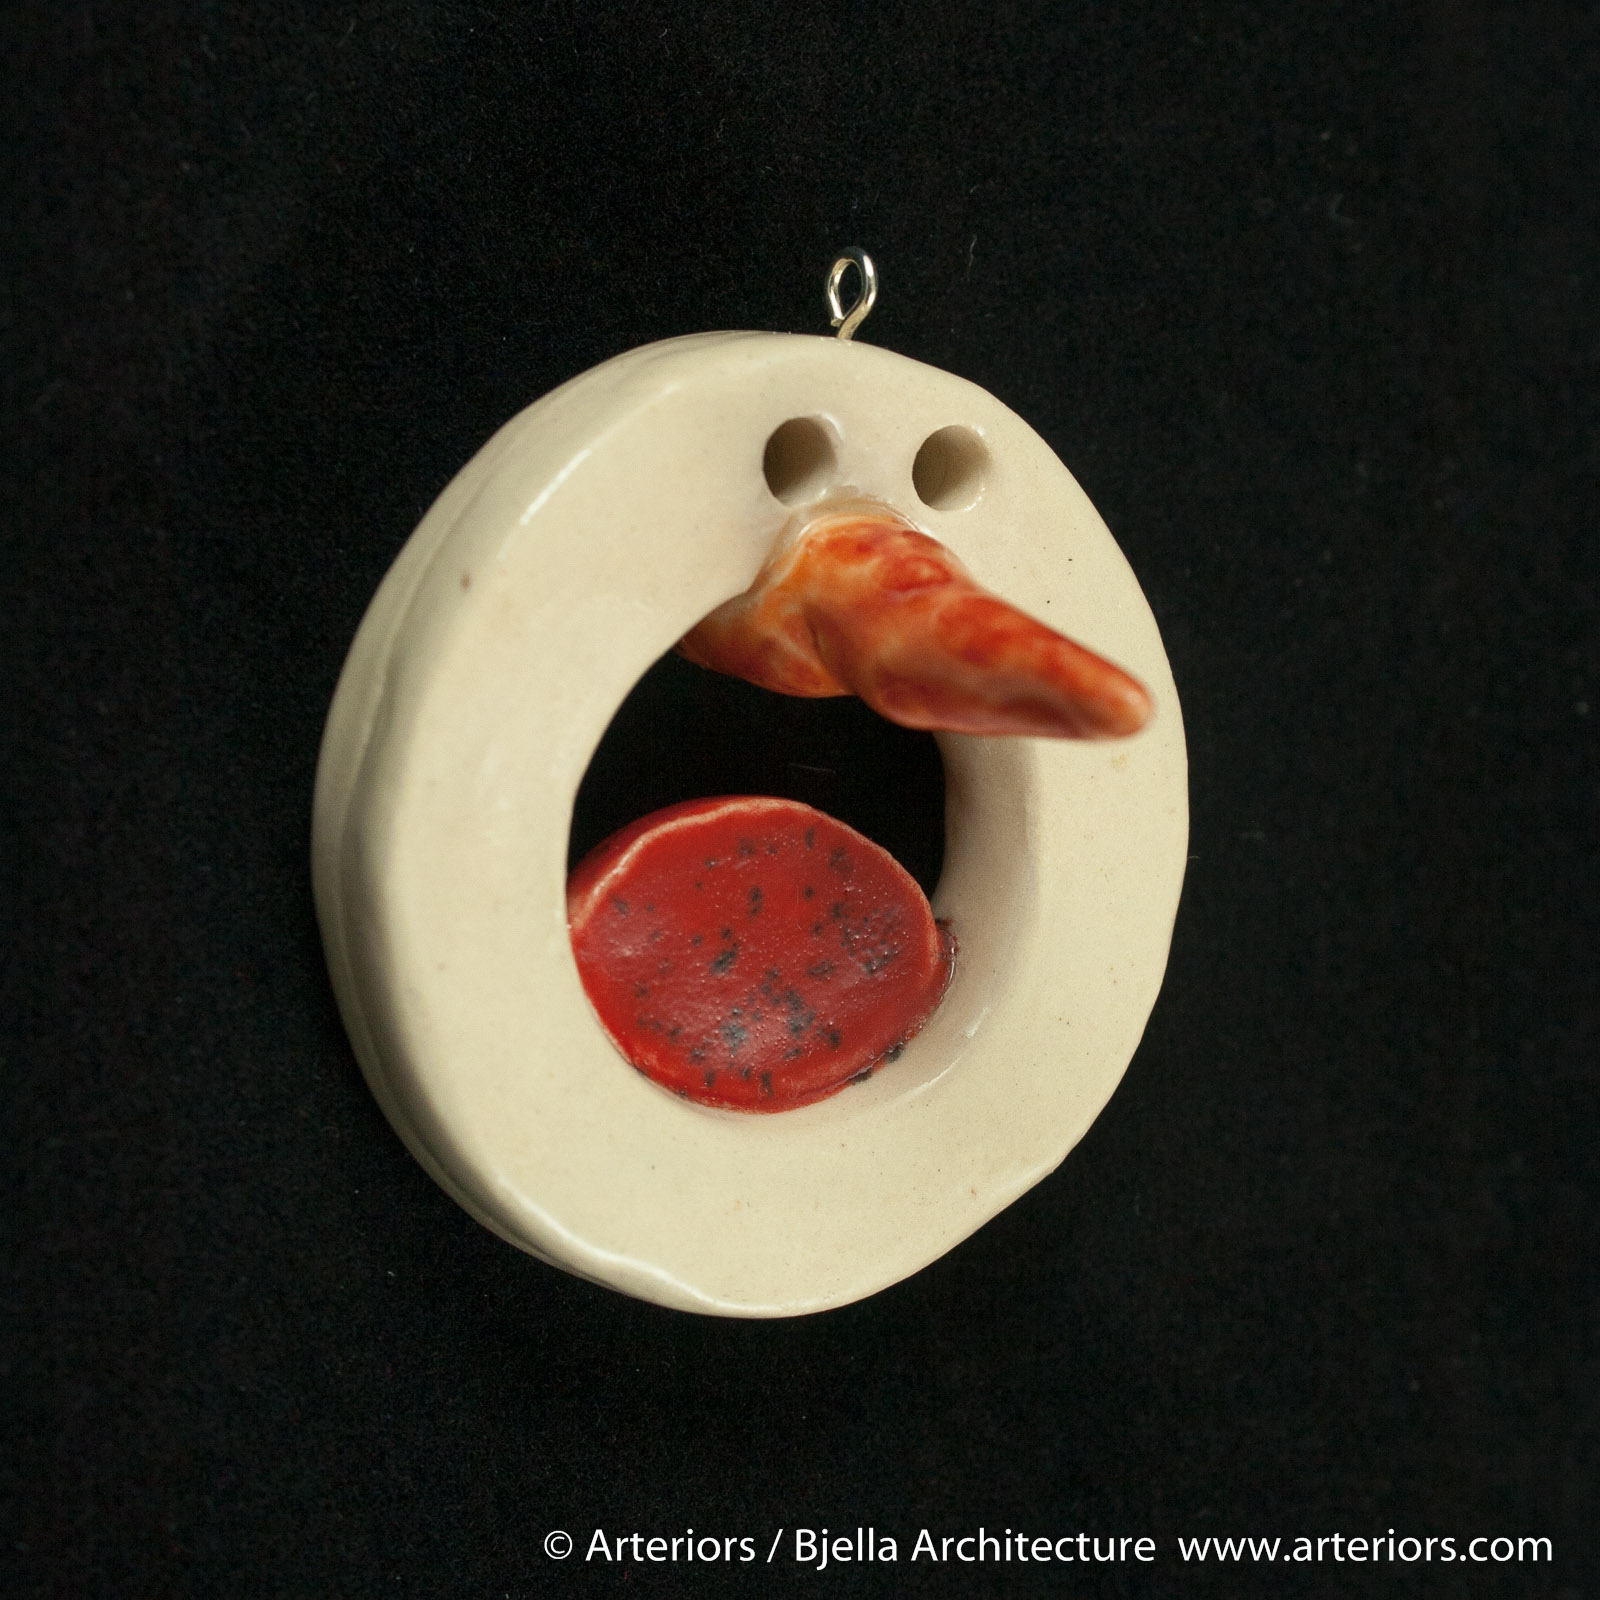 Bjella Snowman Ornament - Day 5 - Rings-14